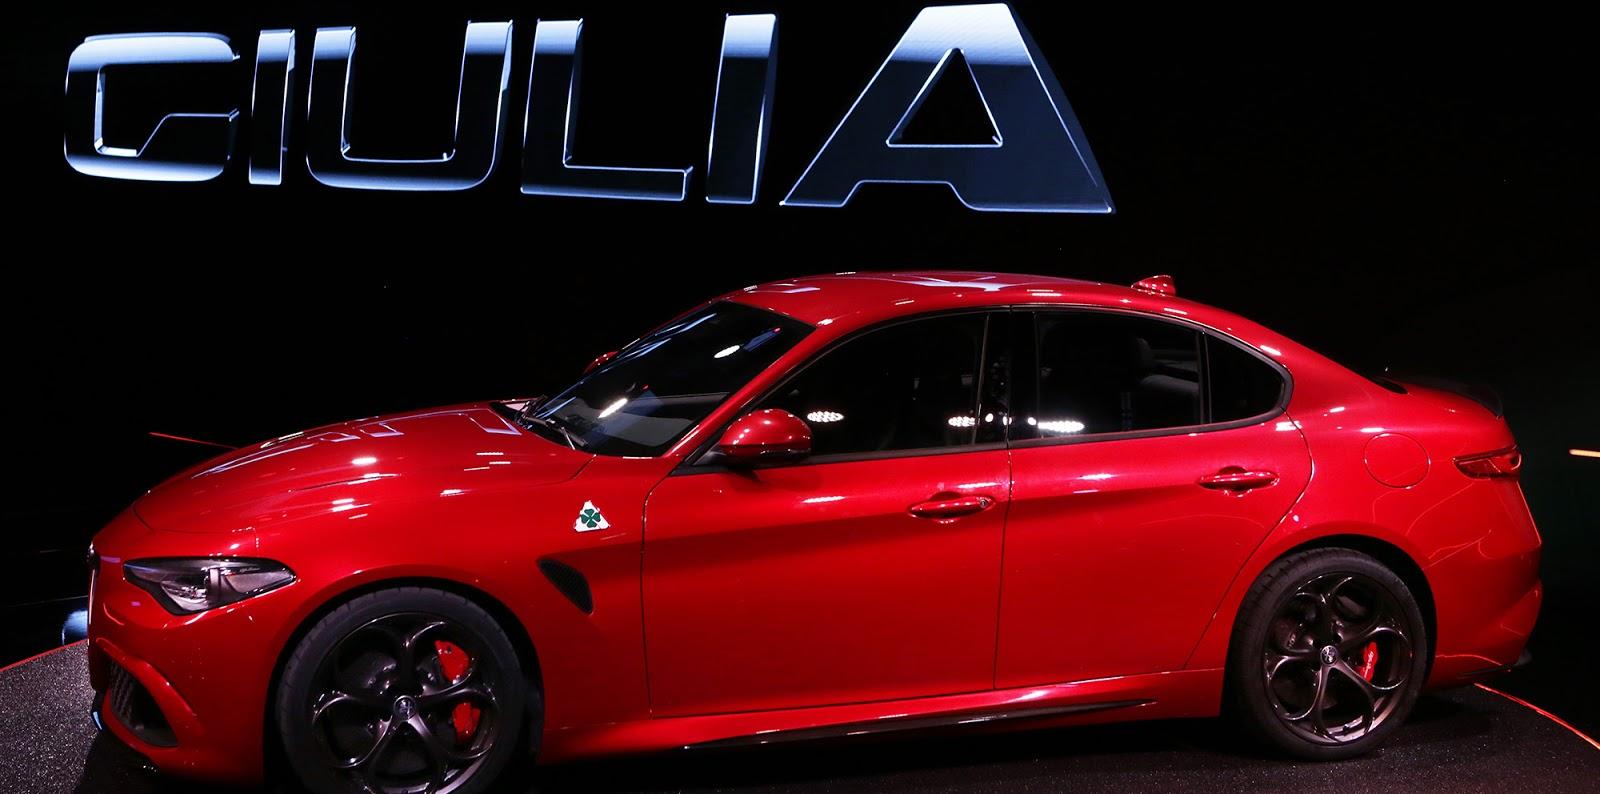 alfa romeo giulia side Δεν γνωρίζεις τι εστί Alfa Romeo άμα δεν γνωρίζεις την ιστορία της Alfa, alfa romeo, Alfa Romeo Soul, Alfisti, Giulia, Heritage, museoalfaromeo, videos, zblog